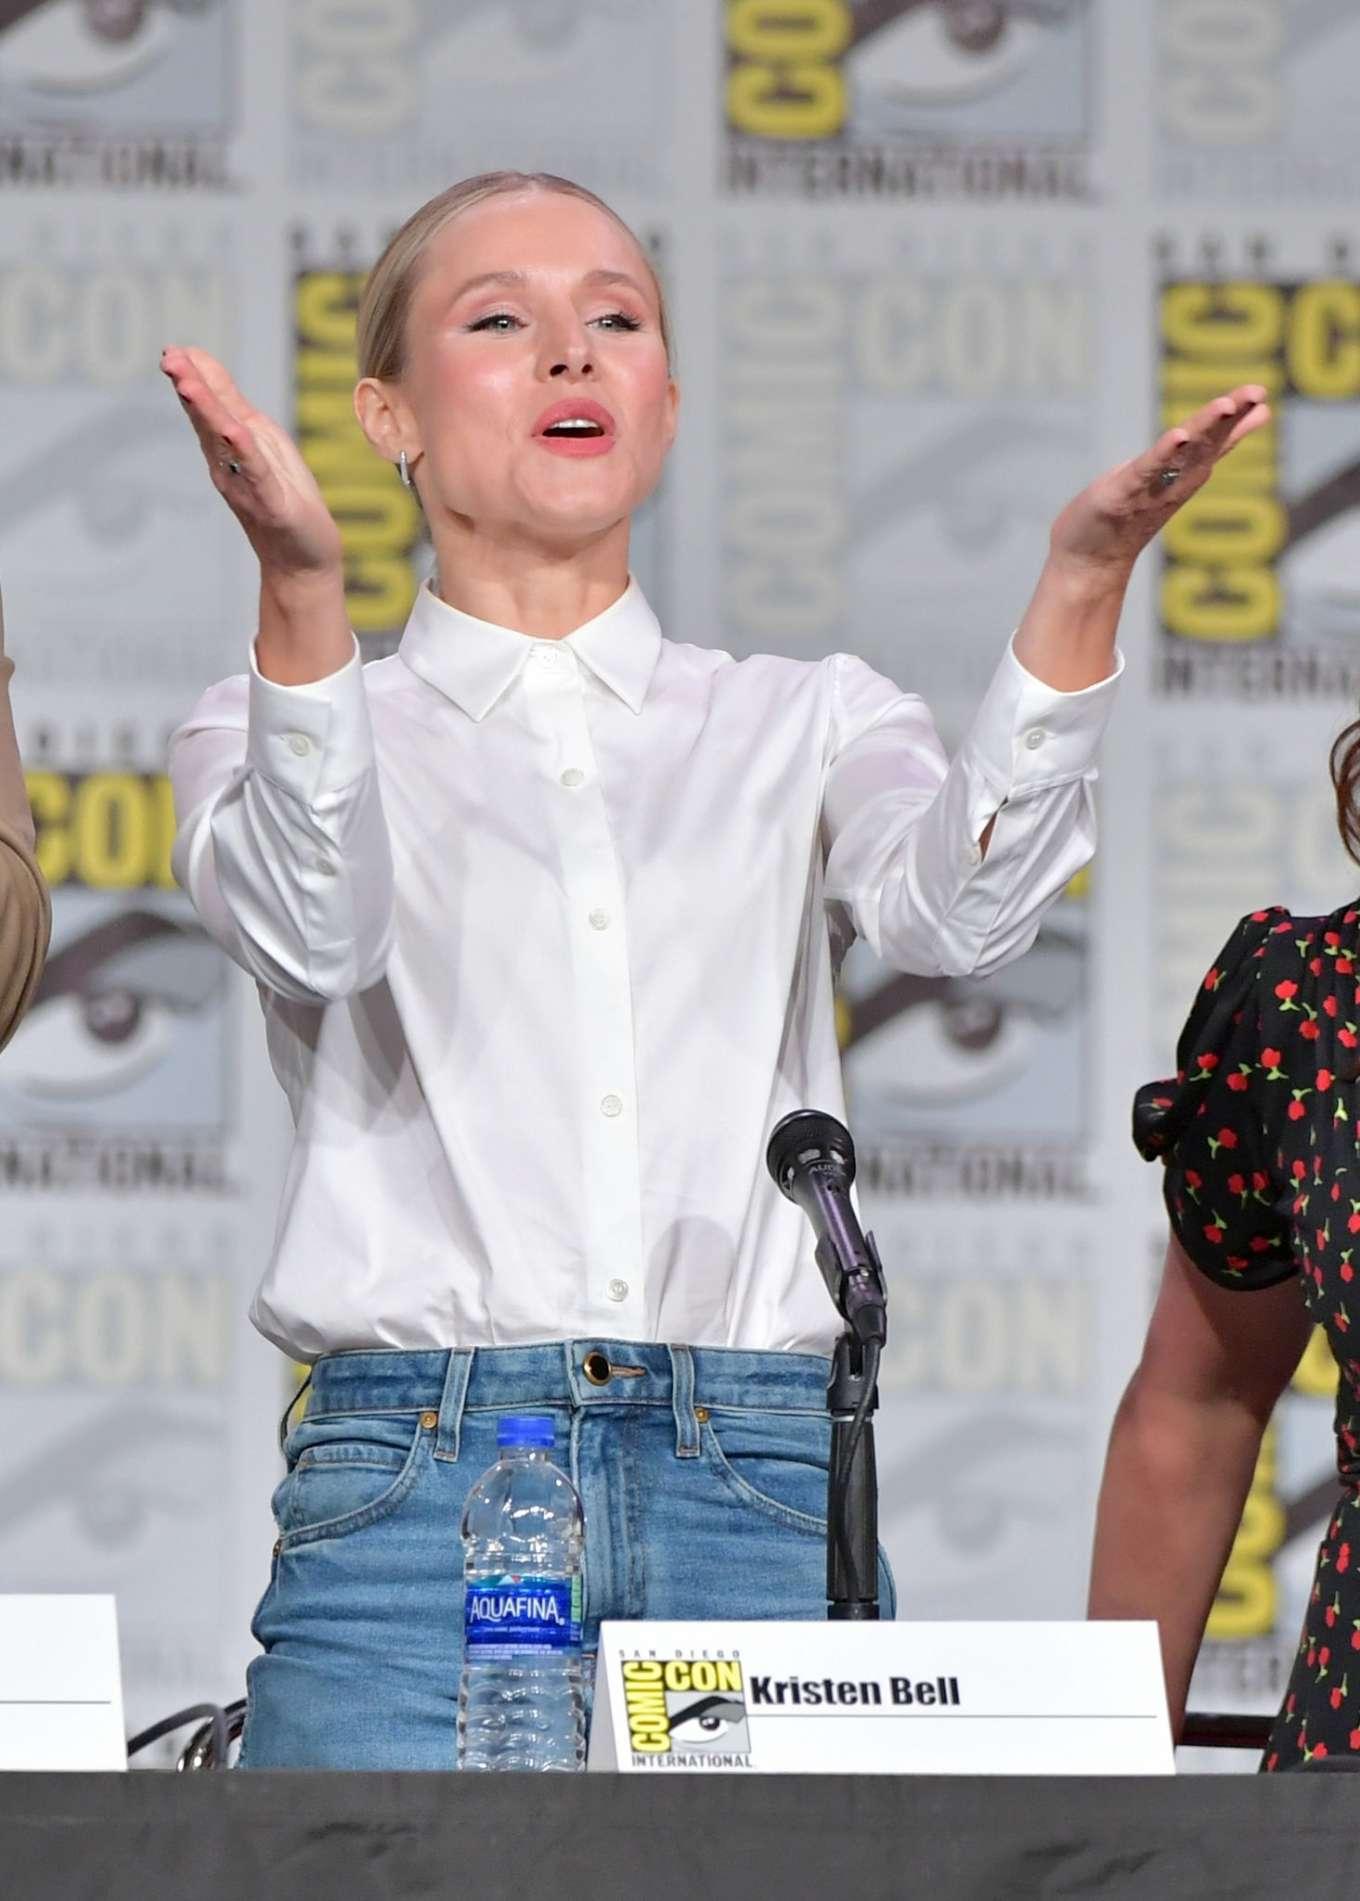 Kristen Bell - 'Veronica Mars' Panel at Comic Con San Diego 2019